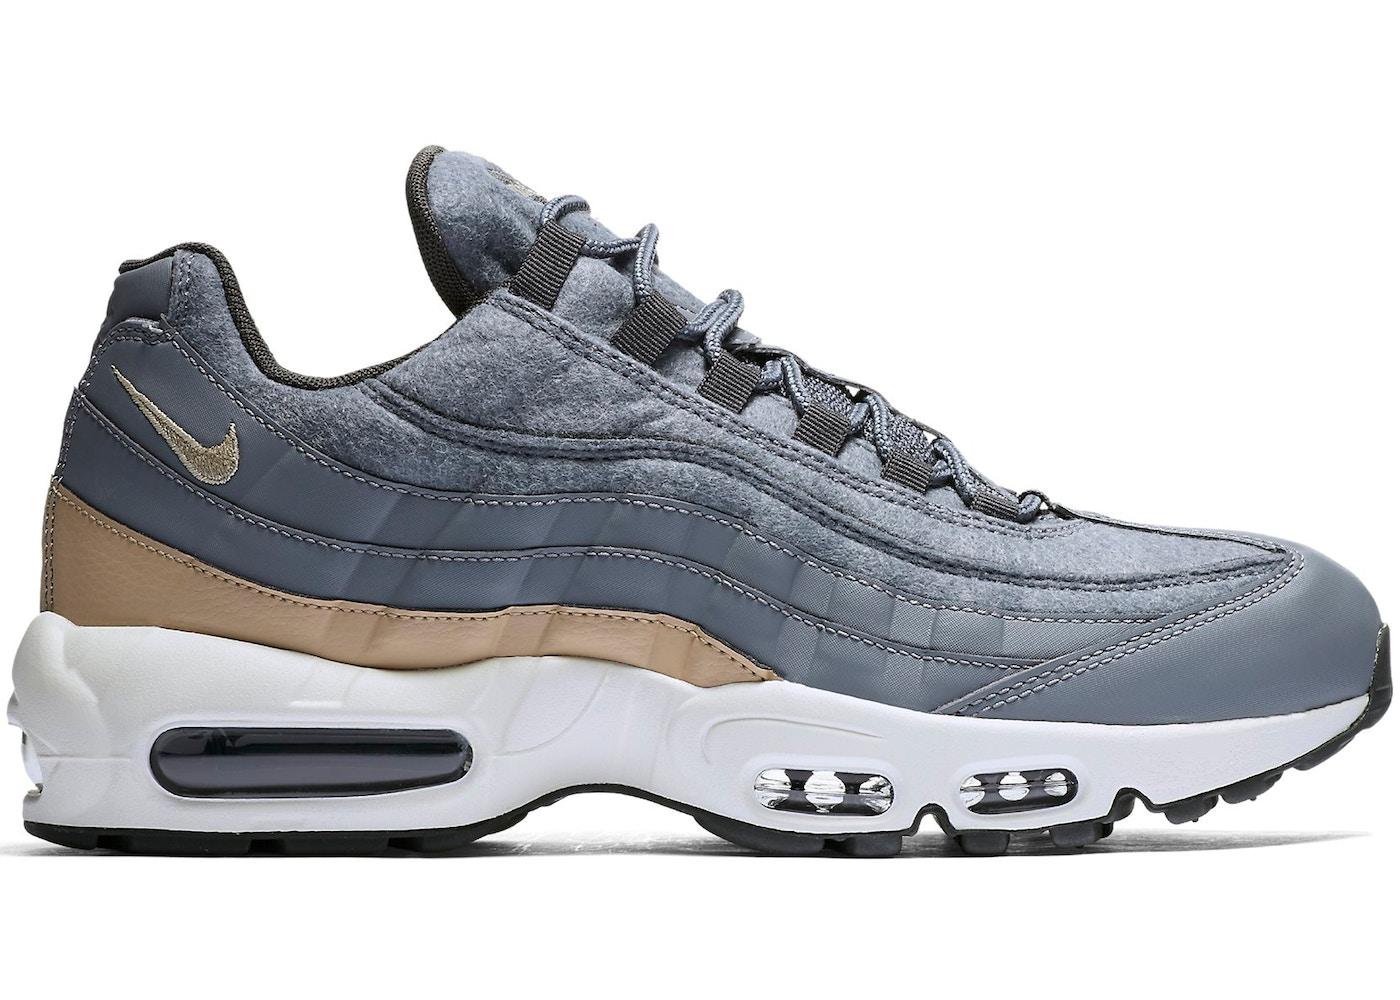 7818266a42881 ... Nike Air Max 95 Premium Wool; Air Max 95 Wool Cool Grey Mushroom ...